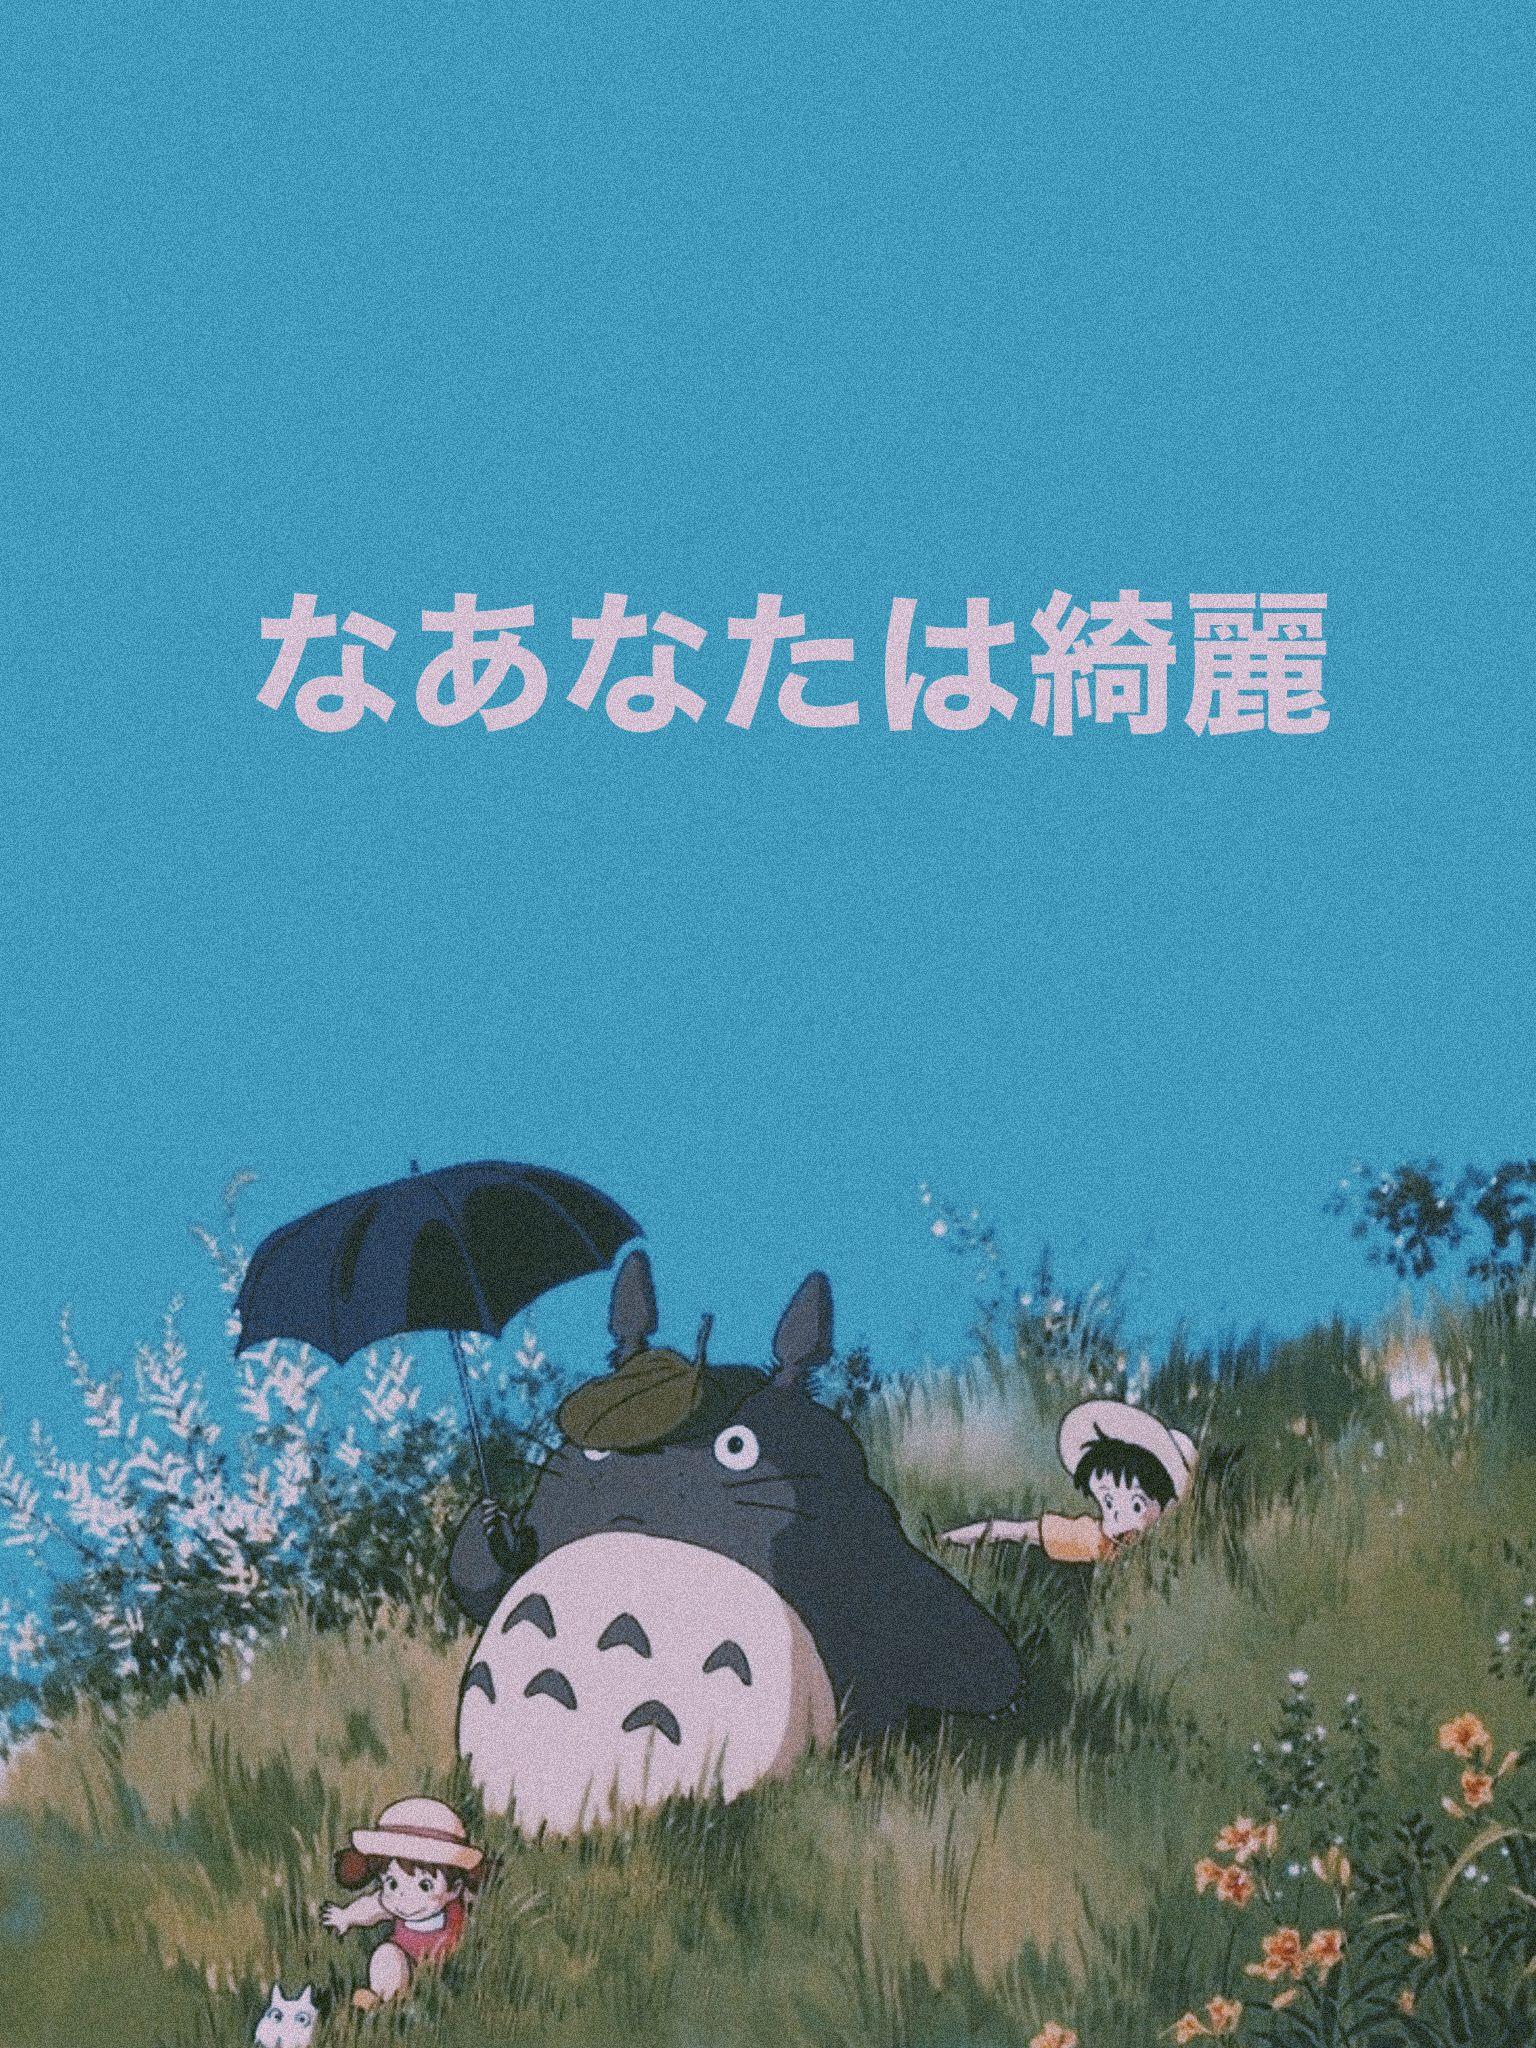 Anime Wallpaper Ipad : anime, wallpaper, Totoro, Anime, Wallpaper, Aesthetic, Wallpaper,